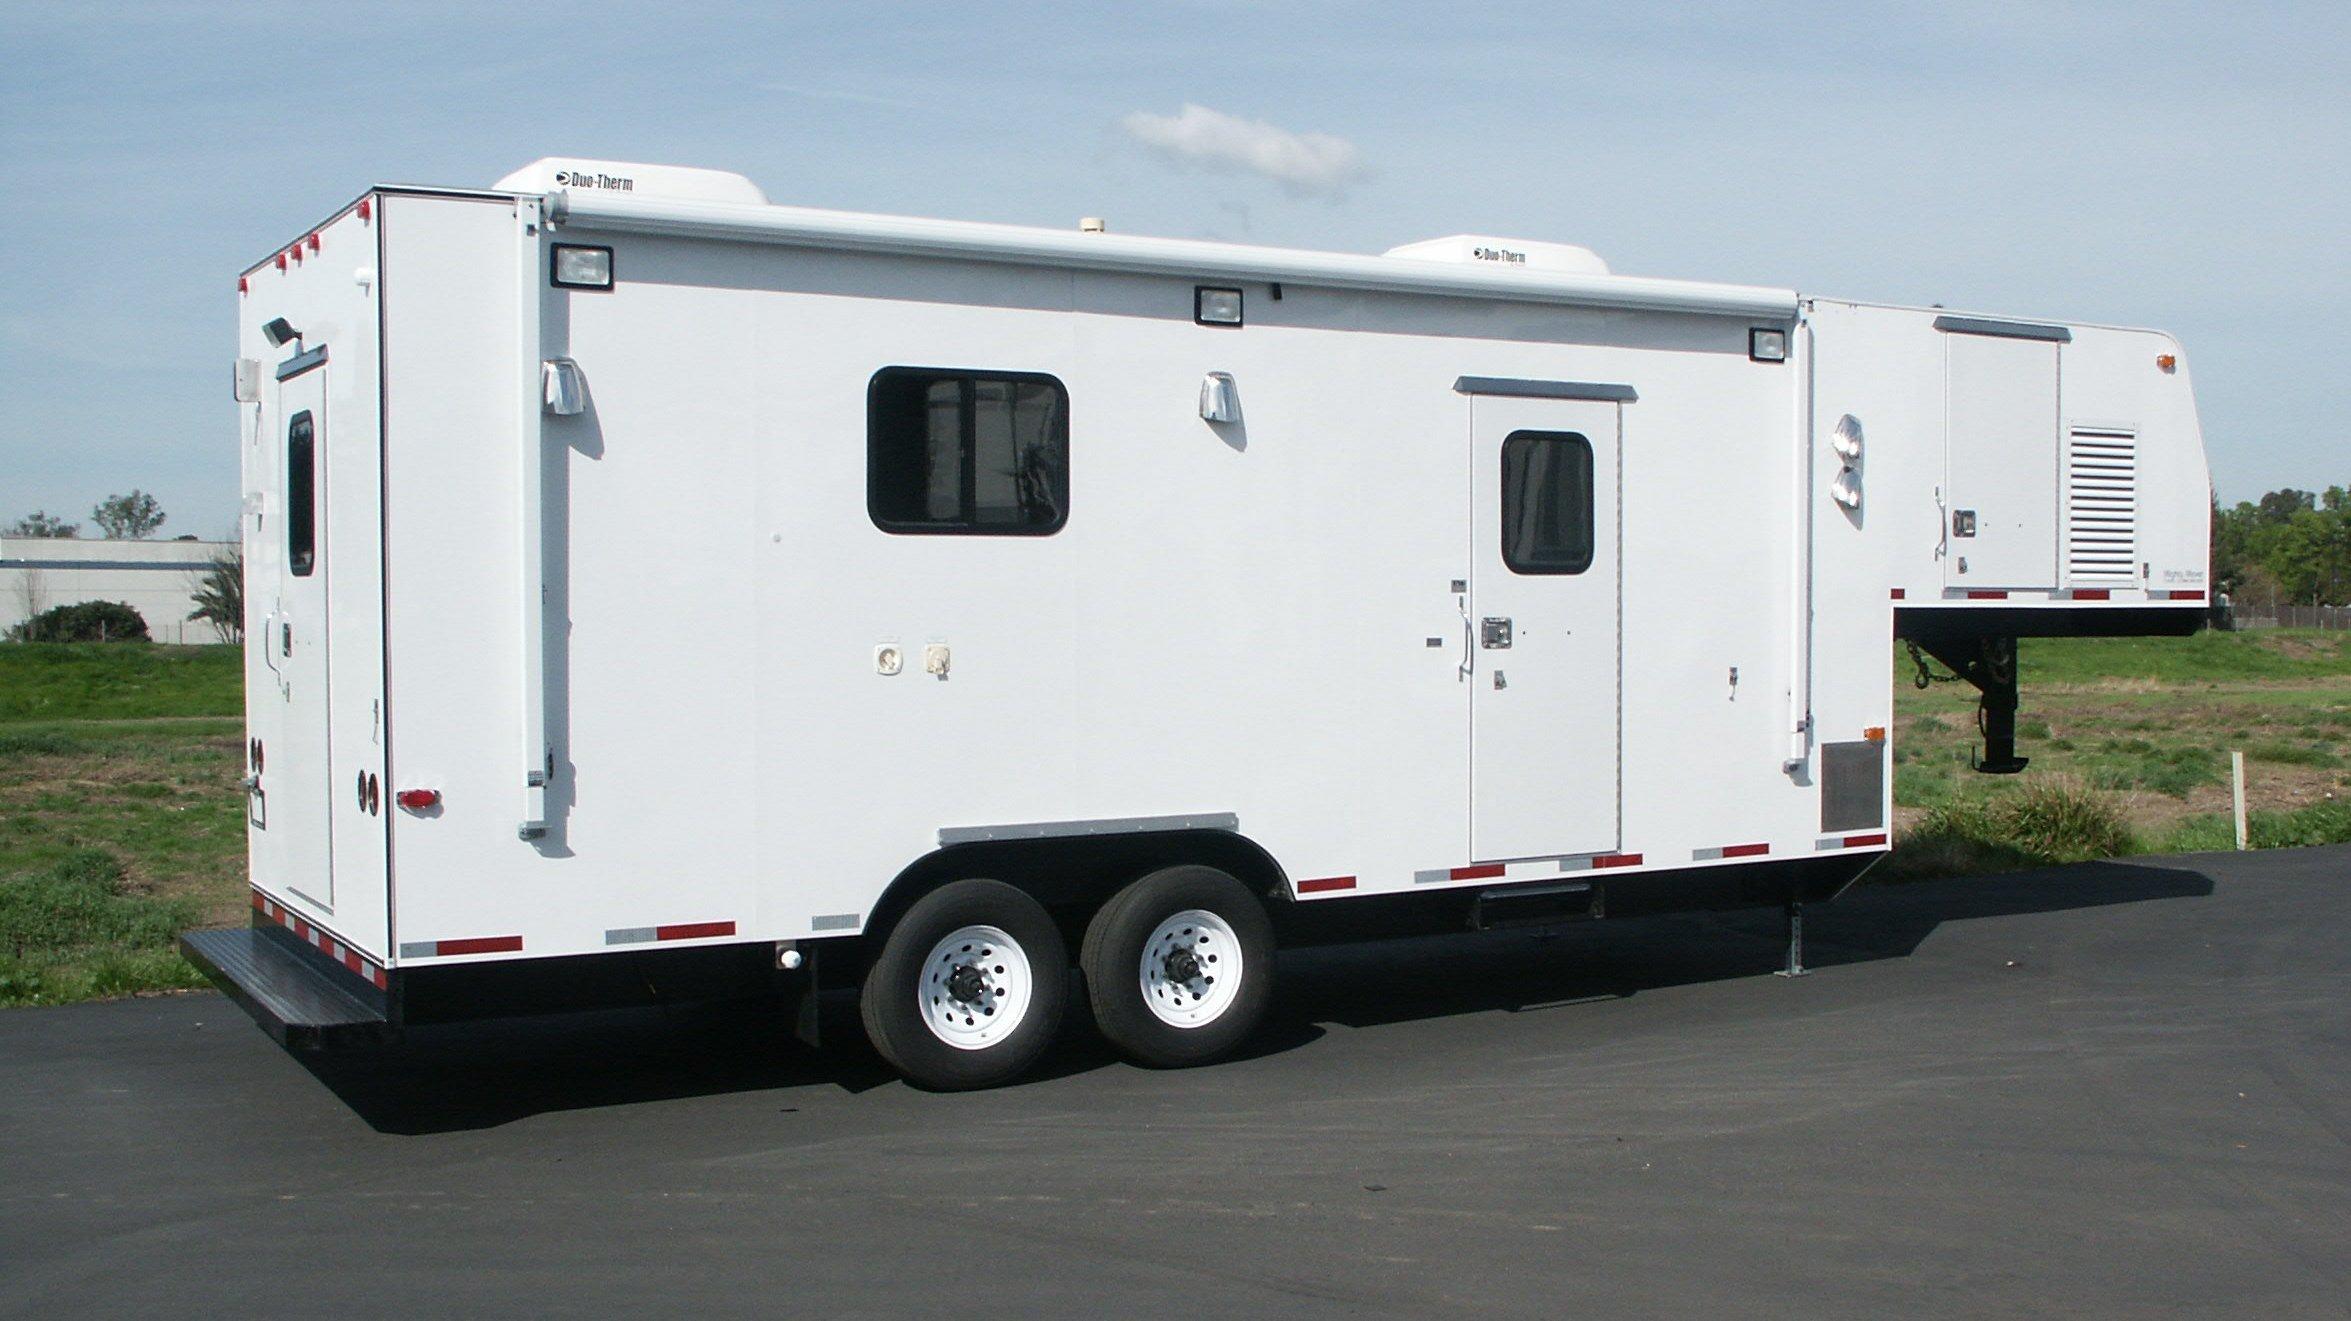 Mobile Laboratory 524D-01 Exterior